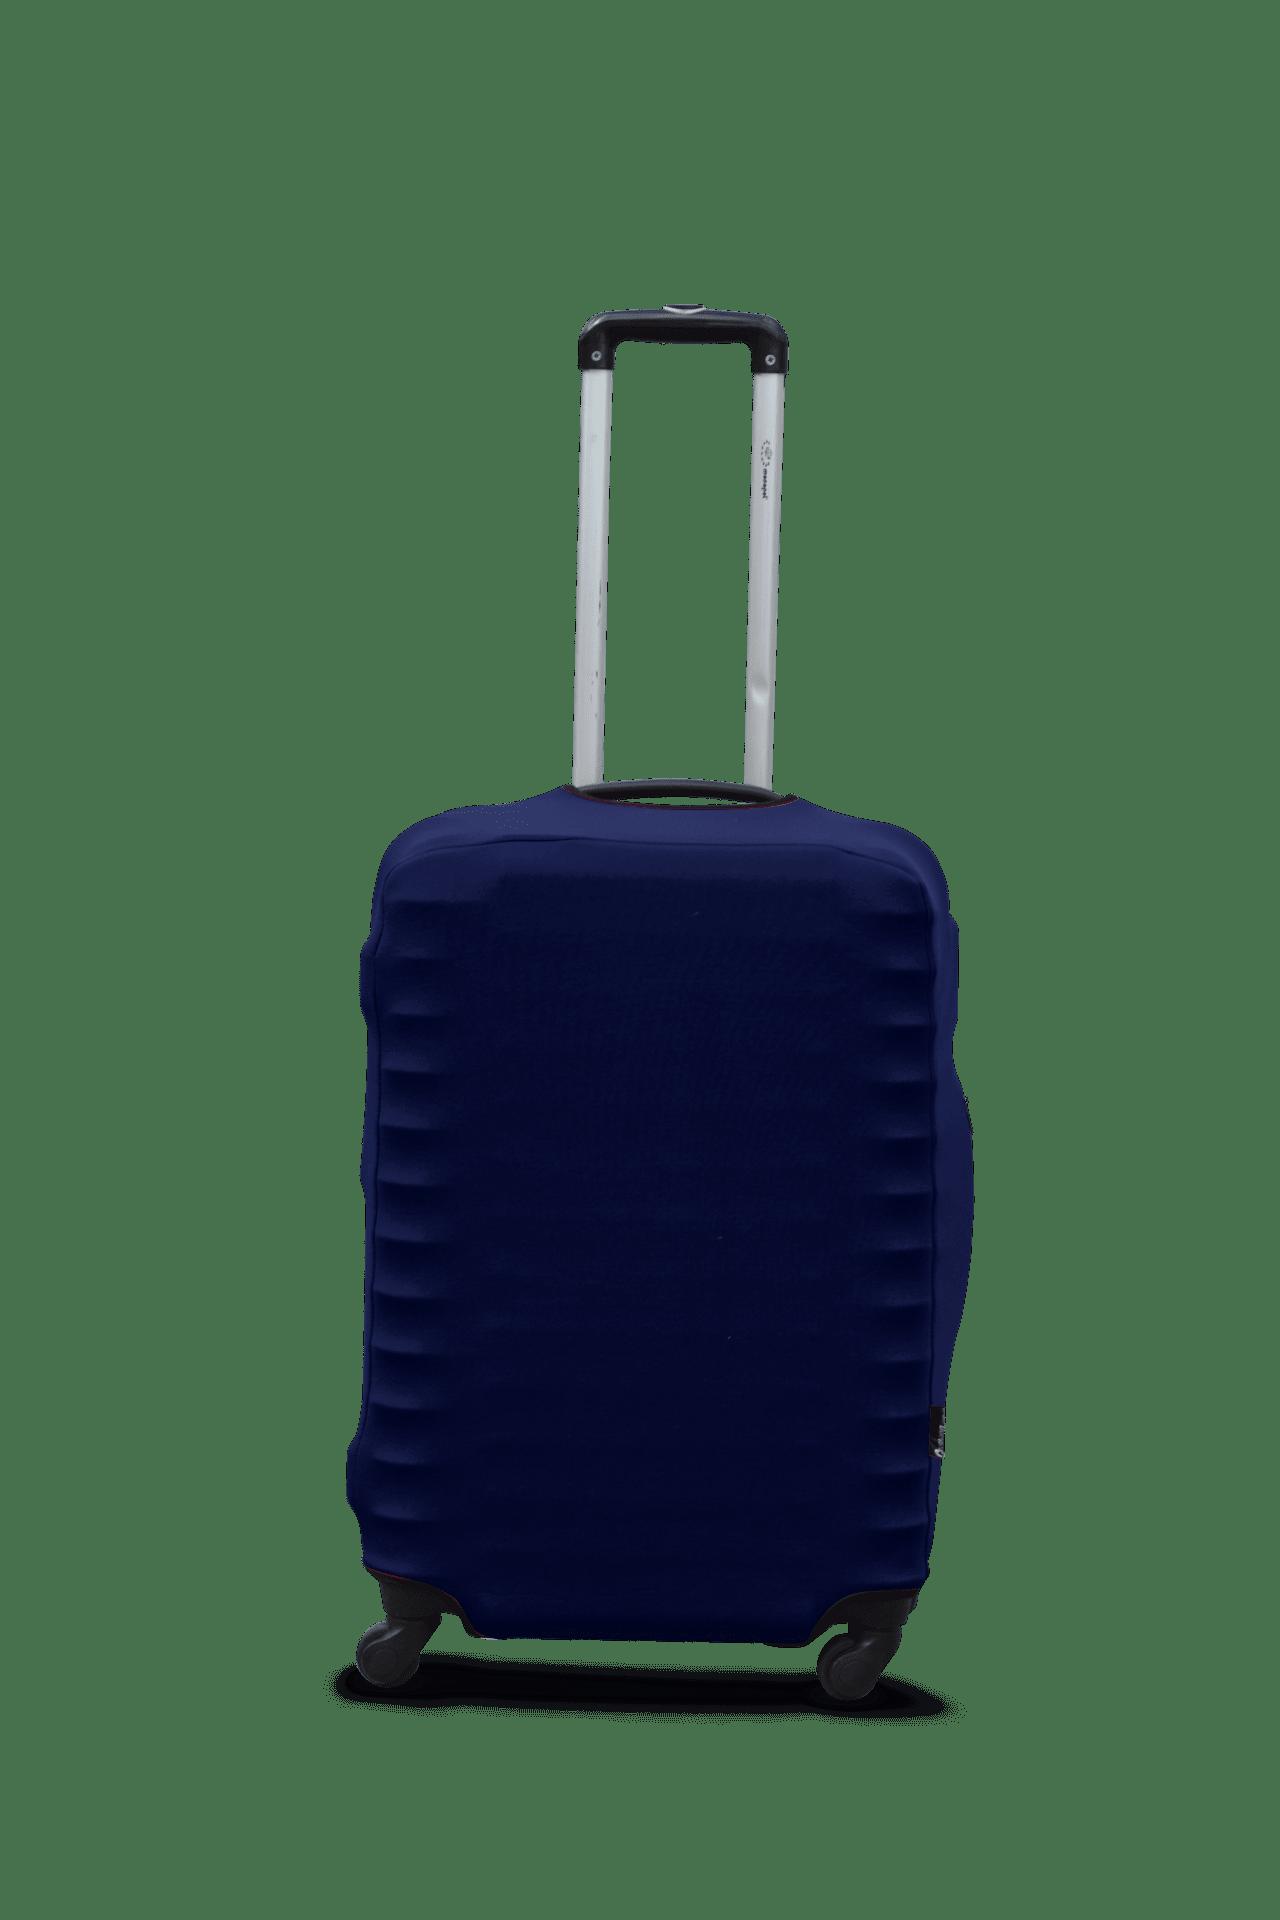 Husa pentru valiza daiving Cover DAWING M BLUE